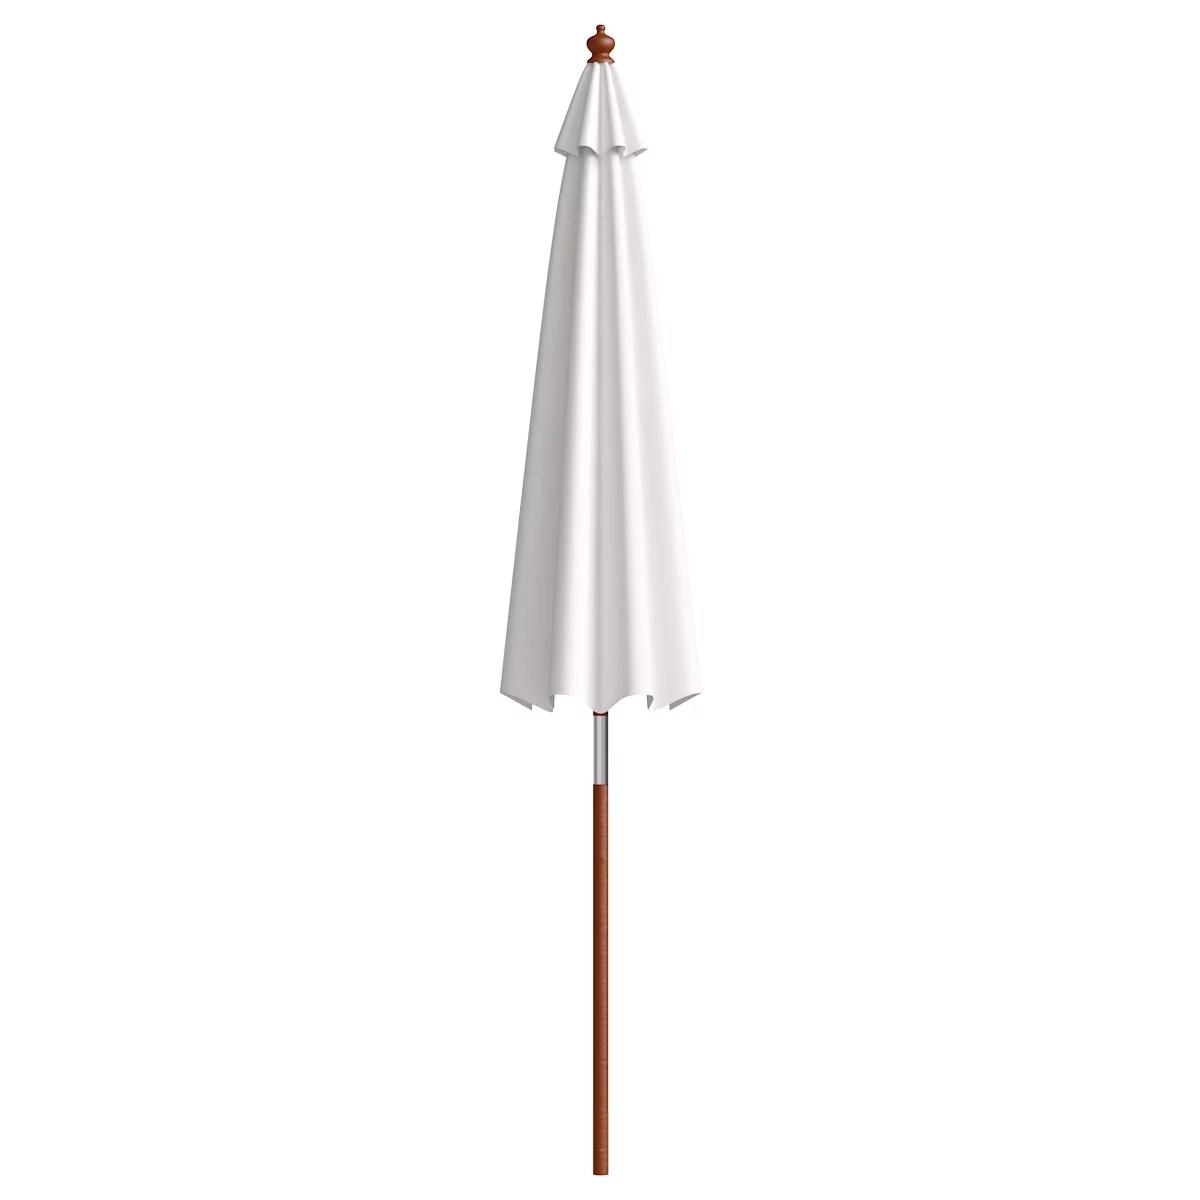 adjustable 9 wooden patio umbrella wood pole outdoor garden sun shade